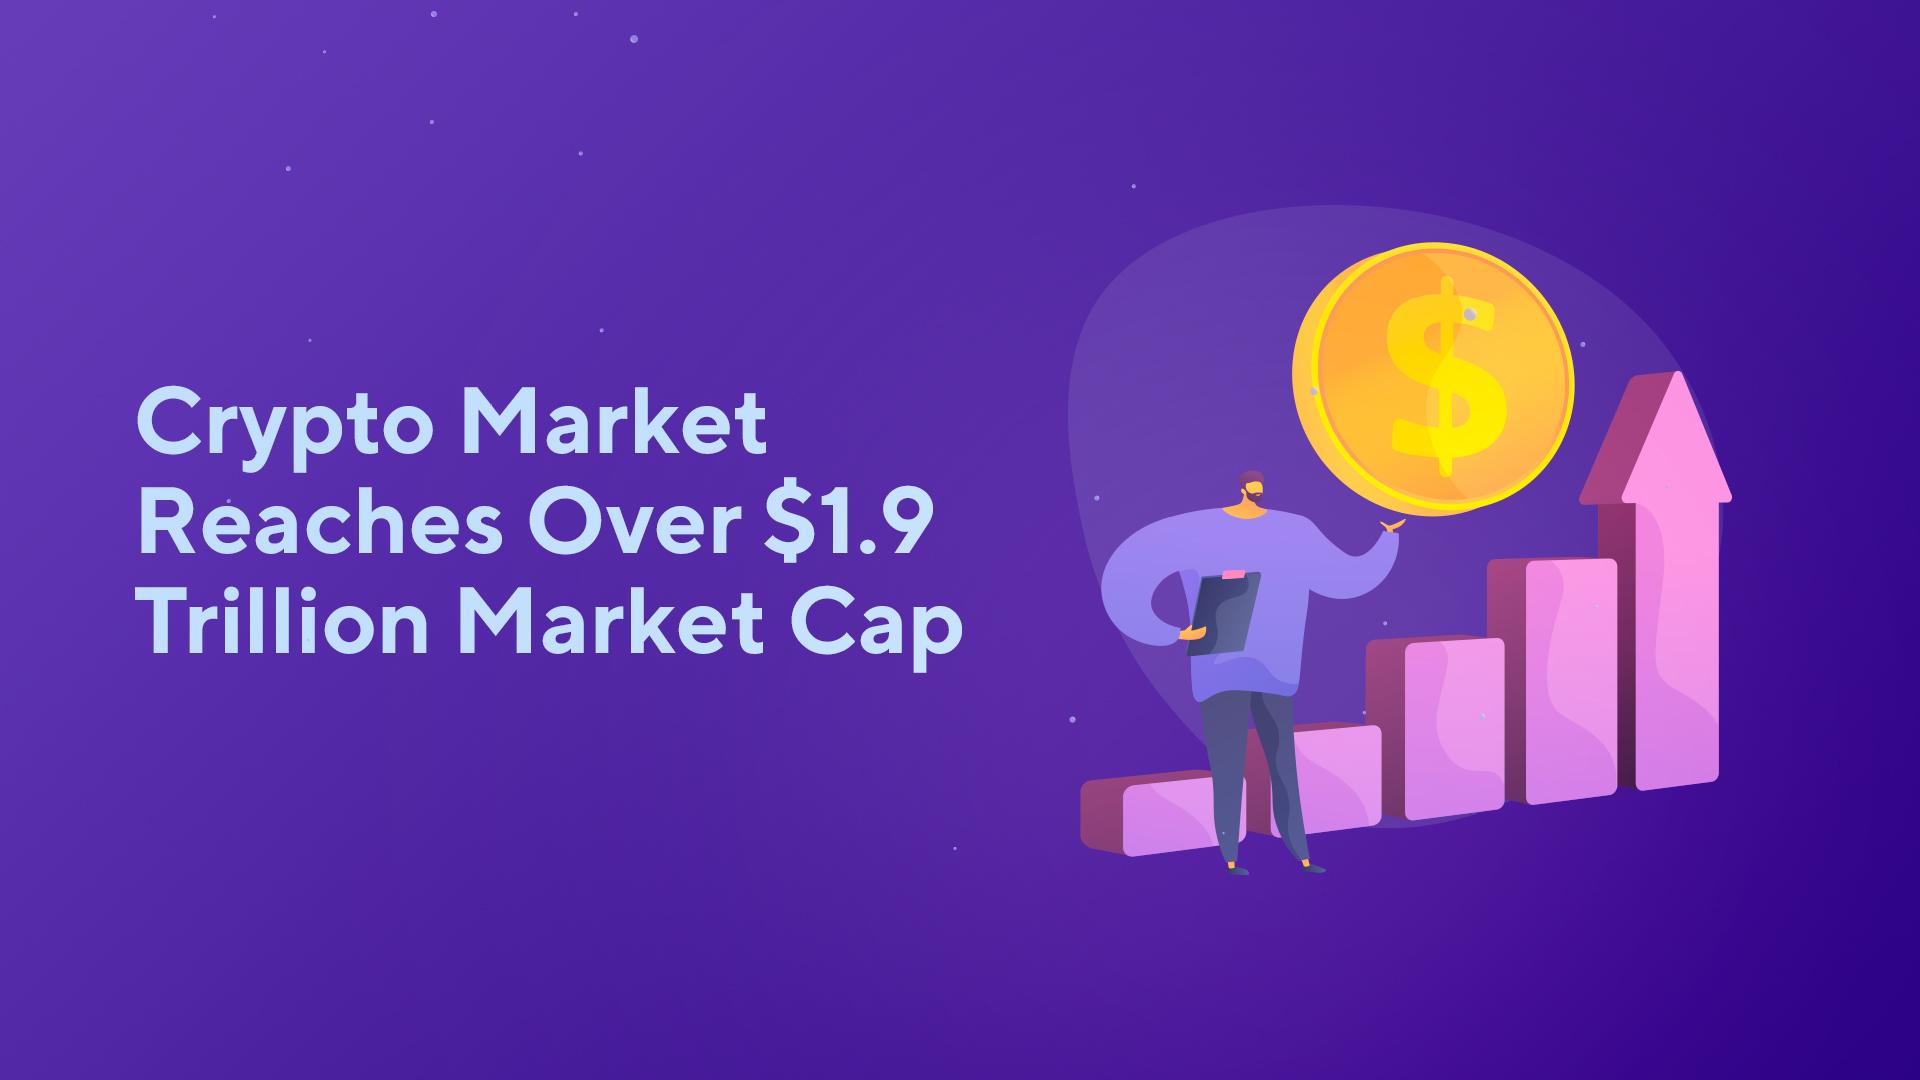 Crypto Market Reaches Over $1.9 Trillion Market Cap